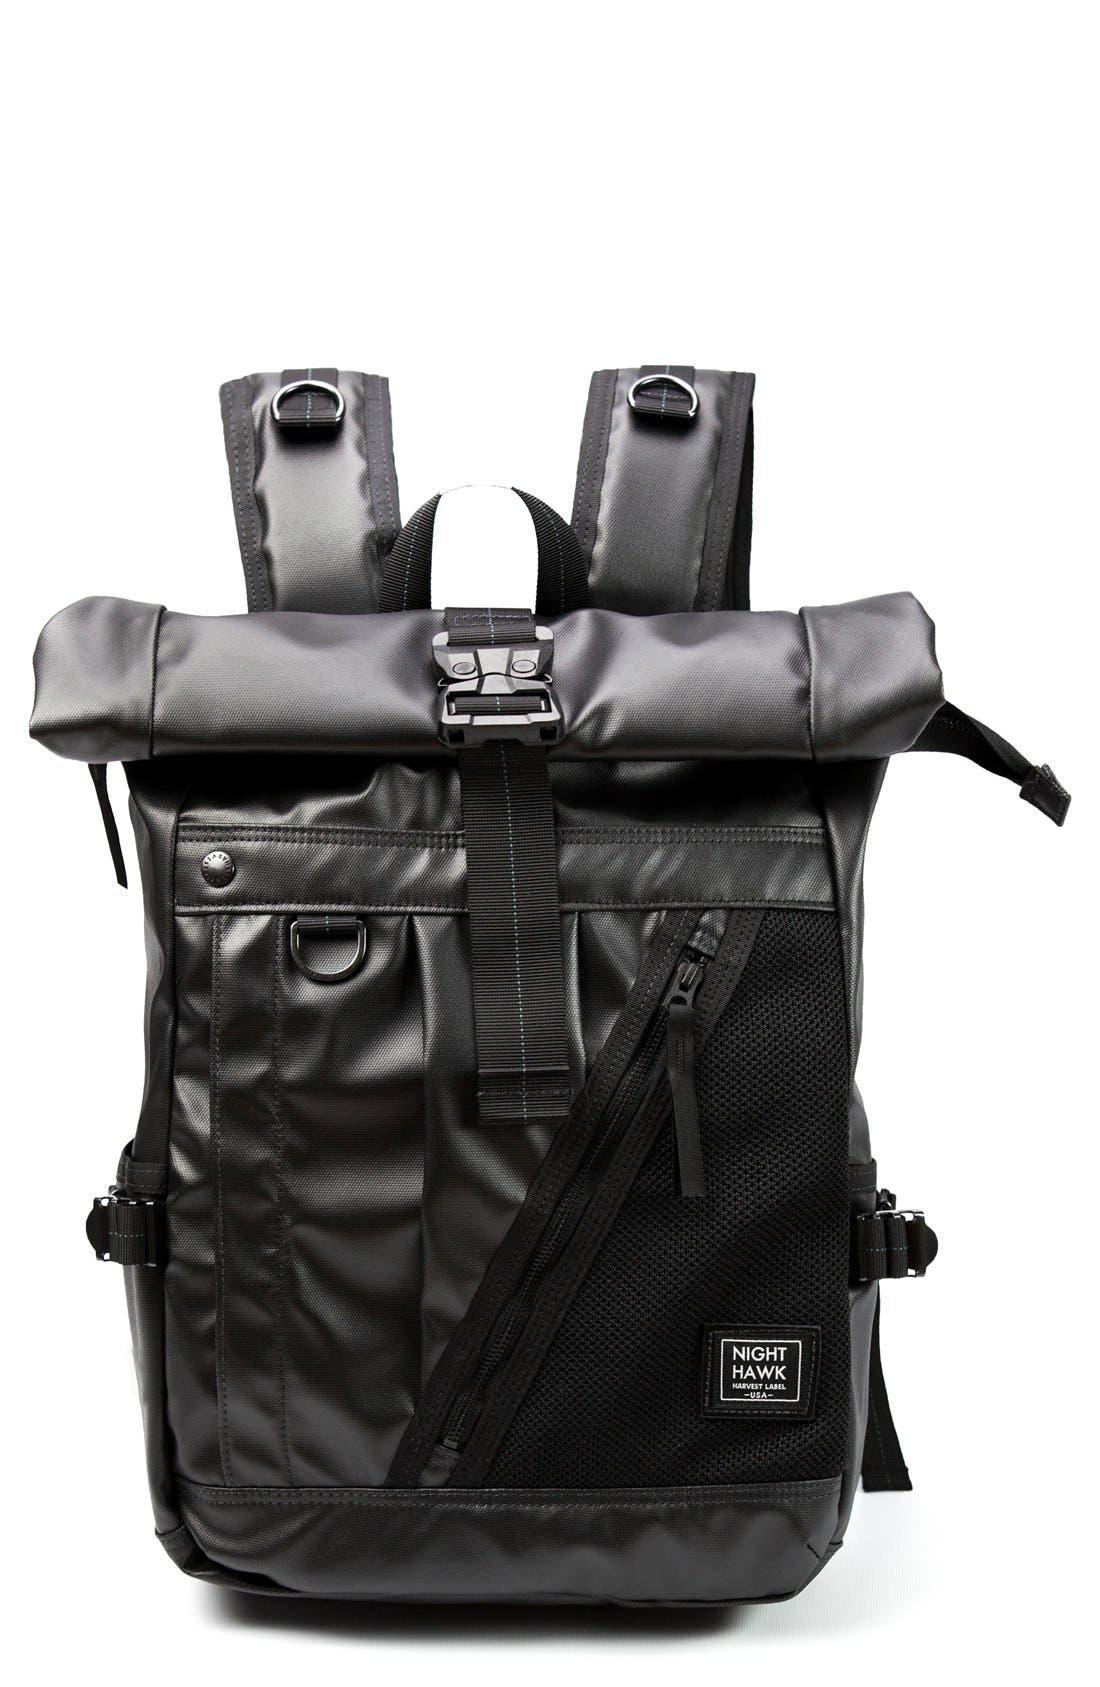 NightHawk Roll Top Backpack,                             Main thumbnail 1, color,                             BLACK